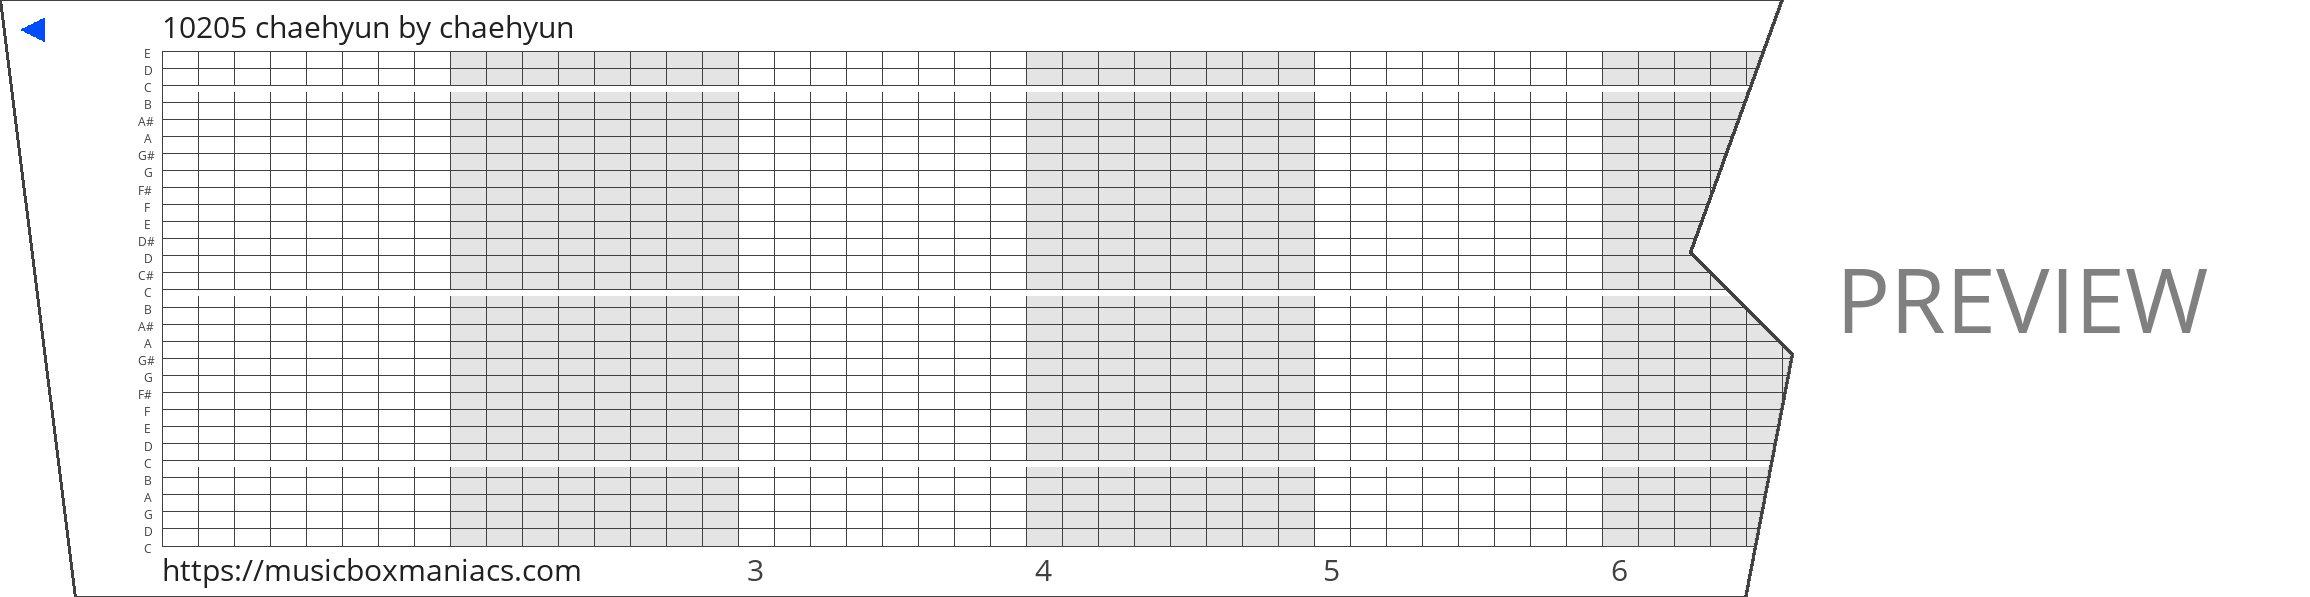 10205 chaehyun 30 note music box paper strip